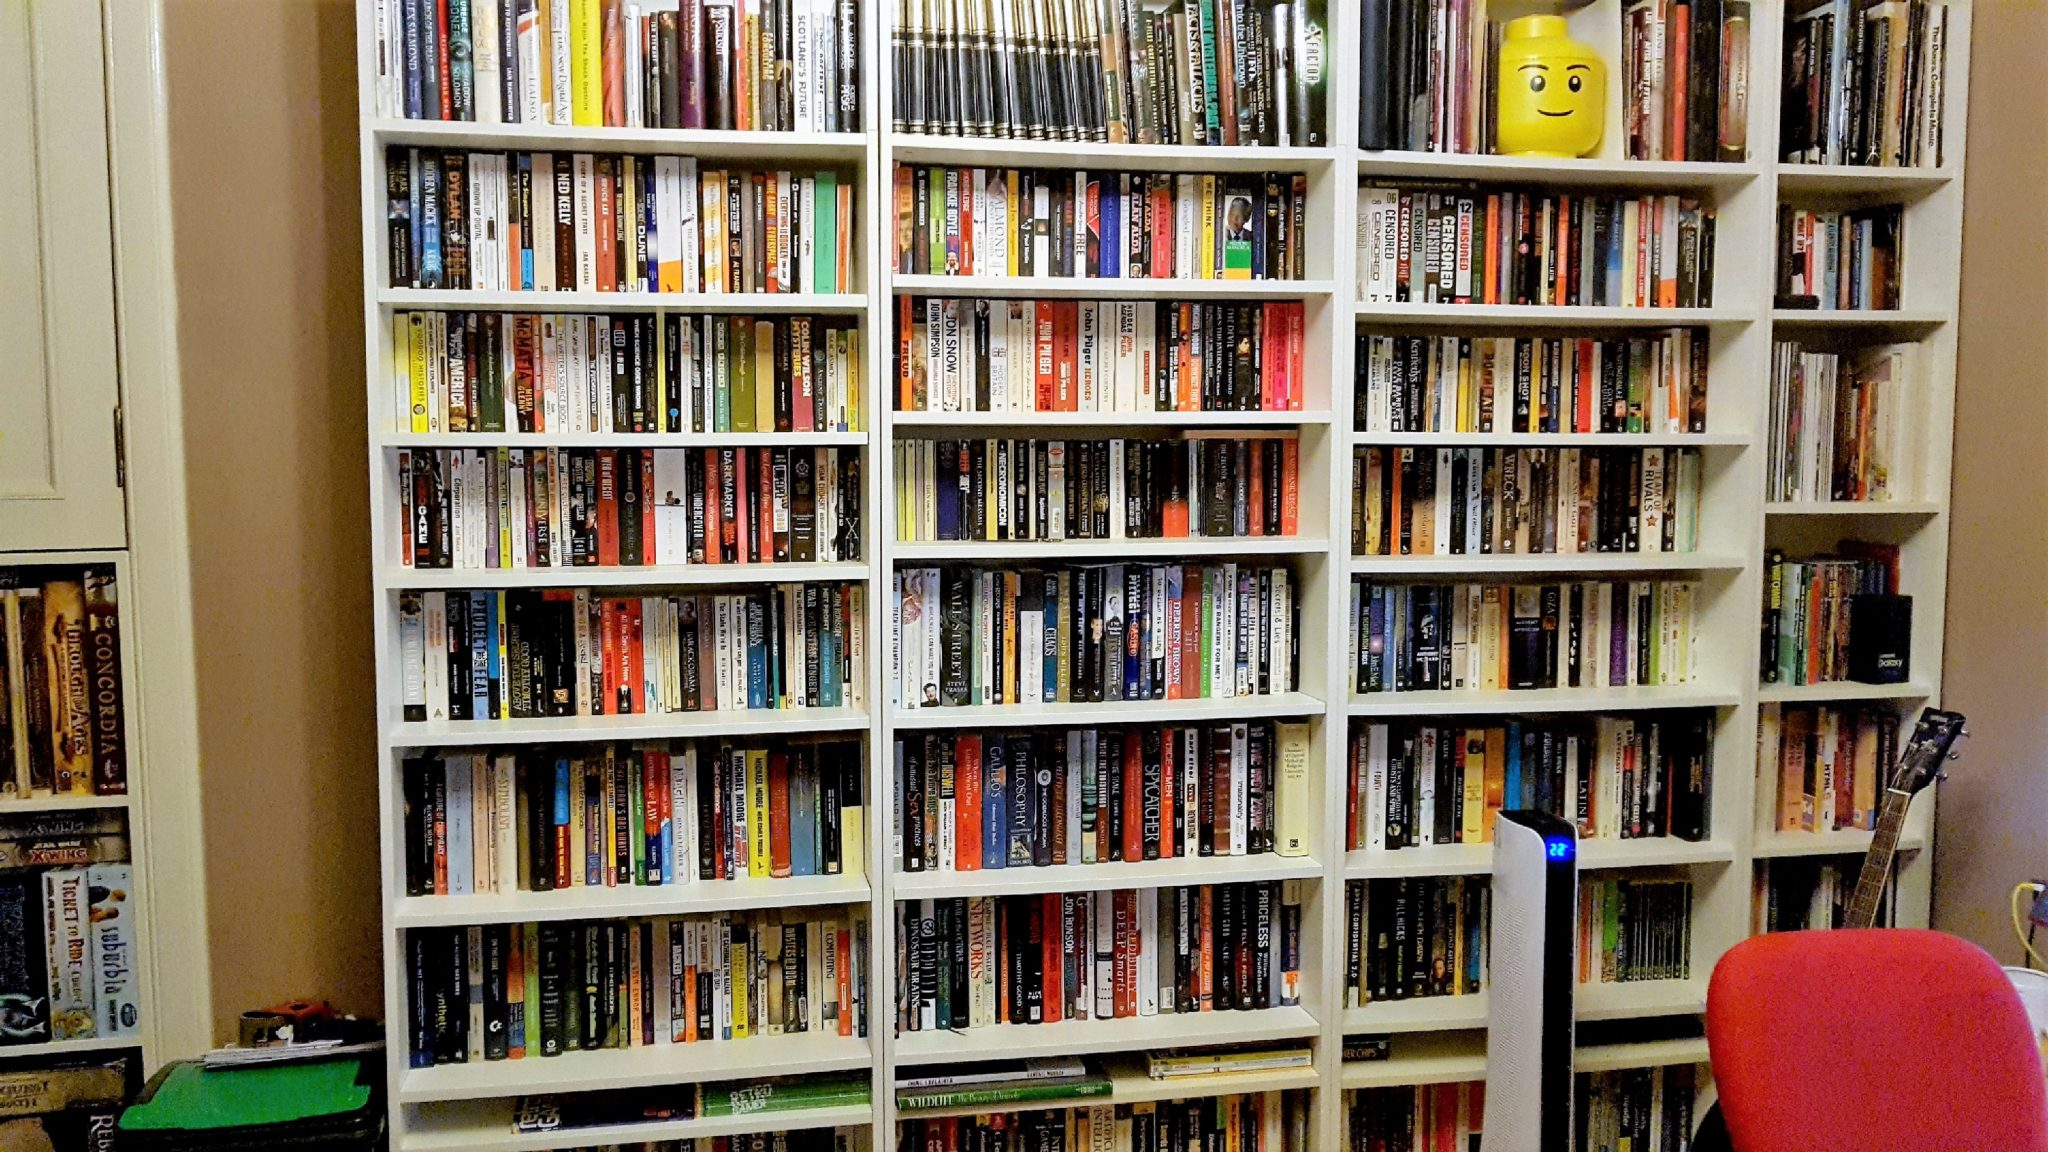 My non-fiction shelves